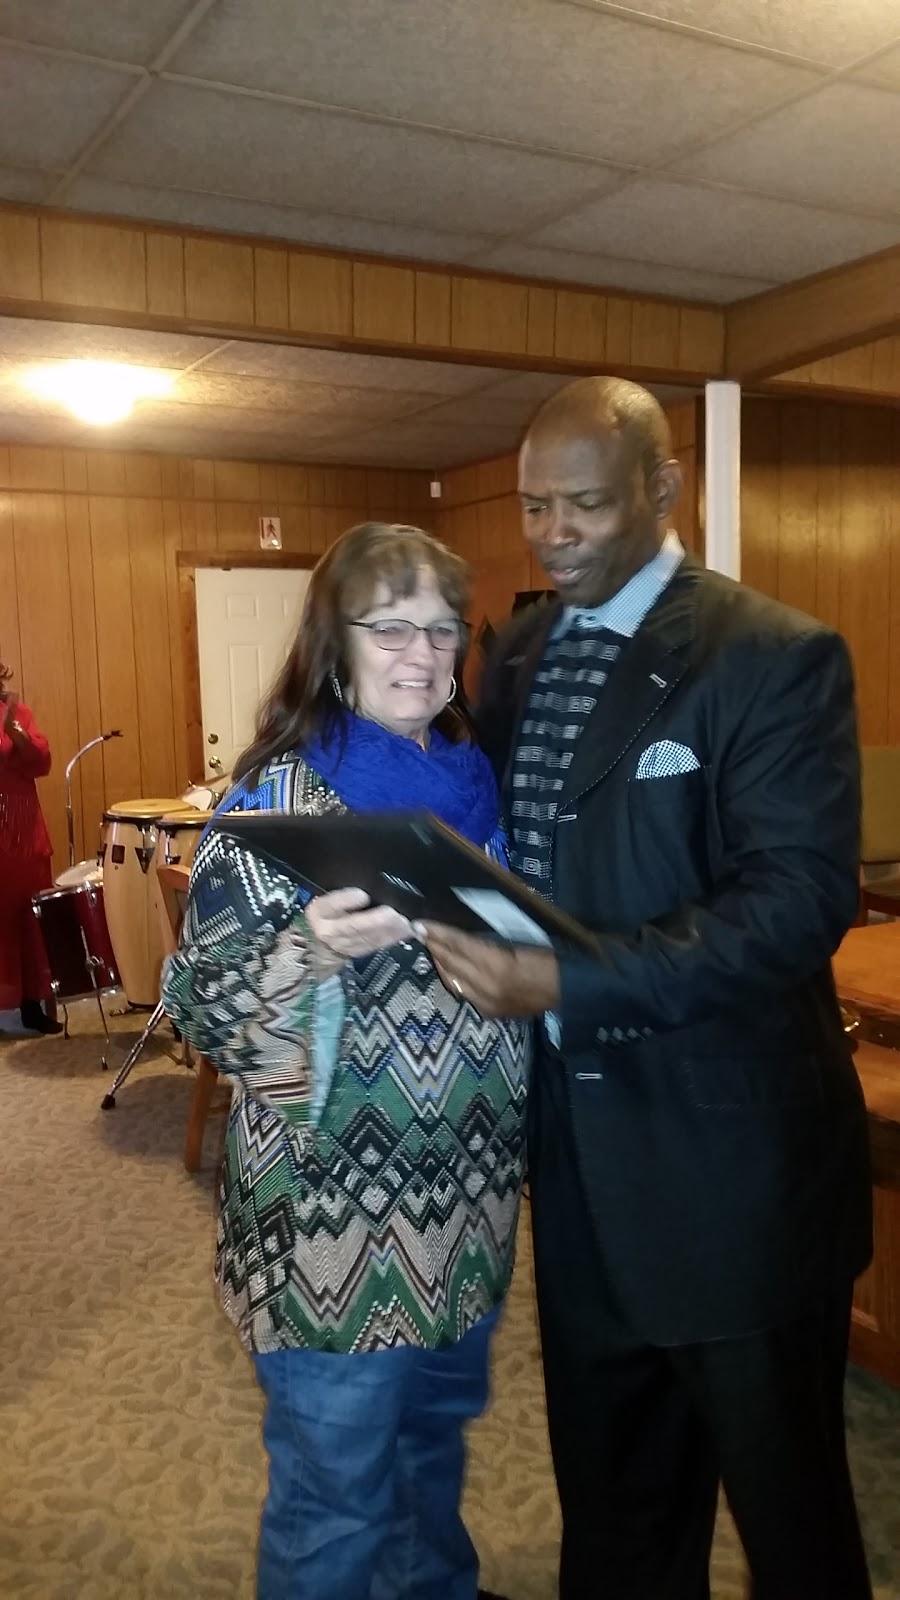 Nehemiah Bible Based Church - church  | Photo 6 of 8 | Address: 800 Burkburnett Rd, Wichita Falls, TX 76306, USA | Phone: (940) 237-2010